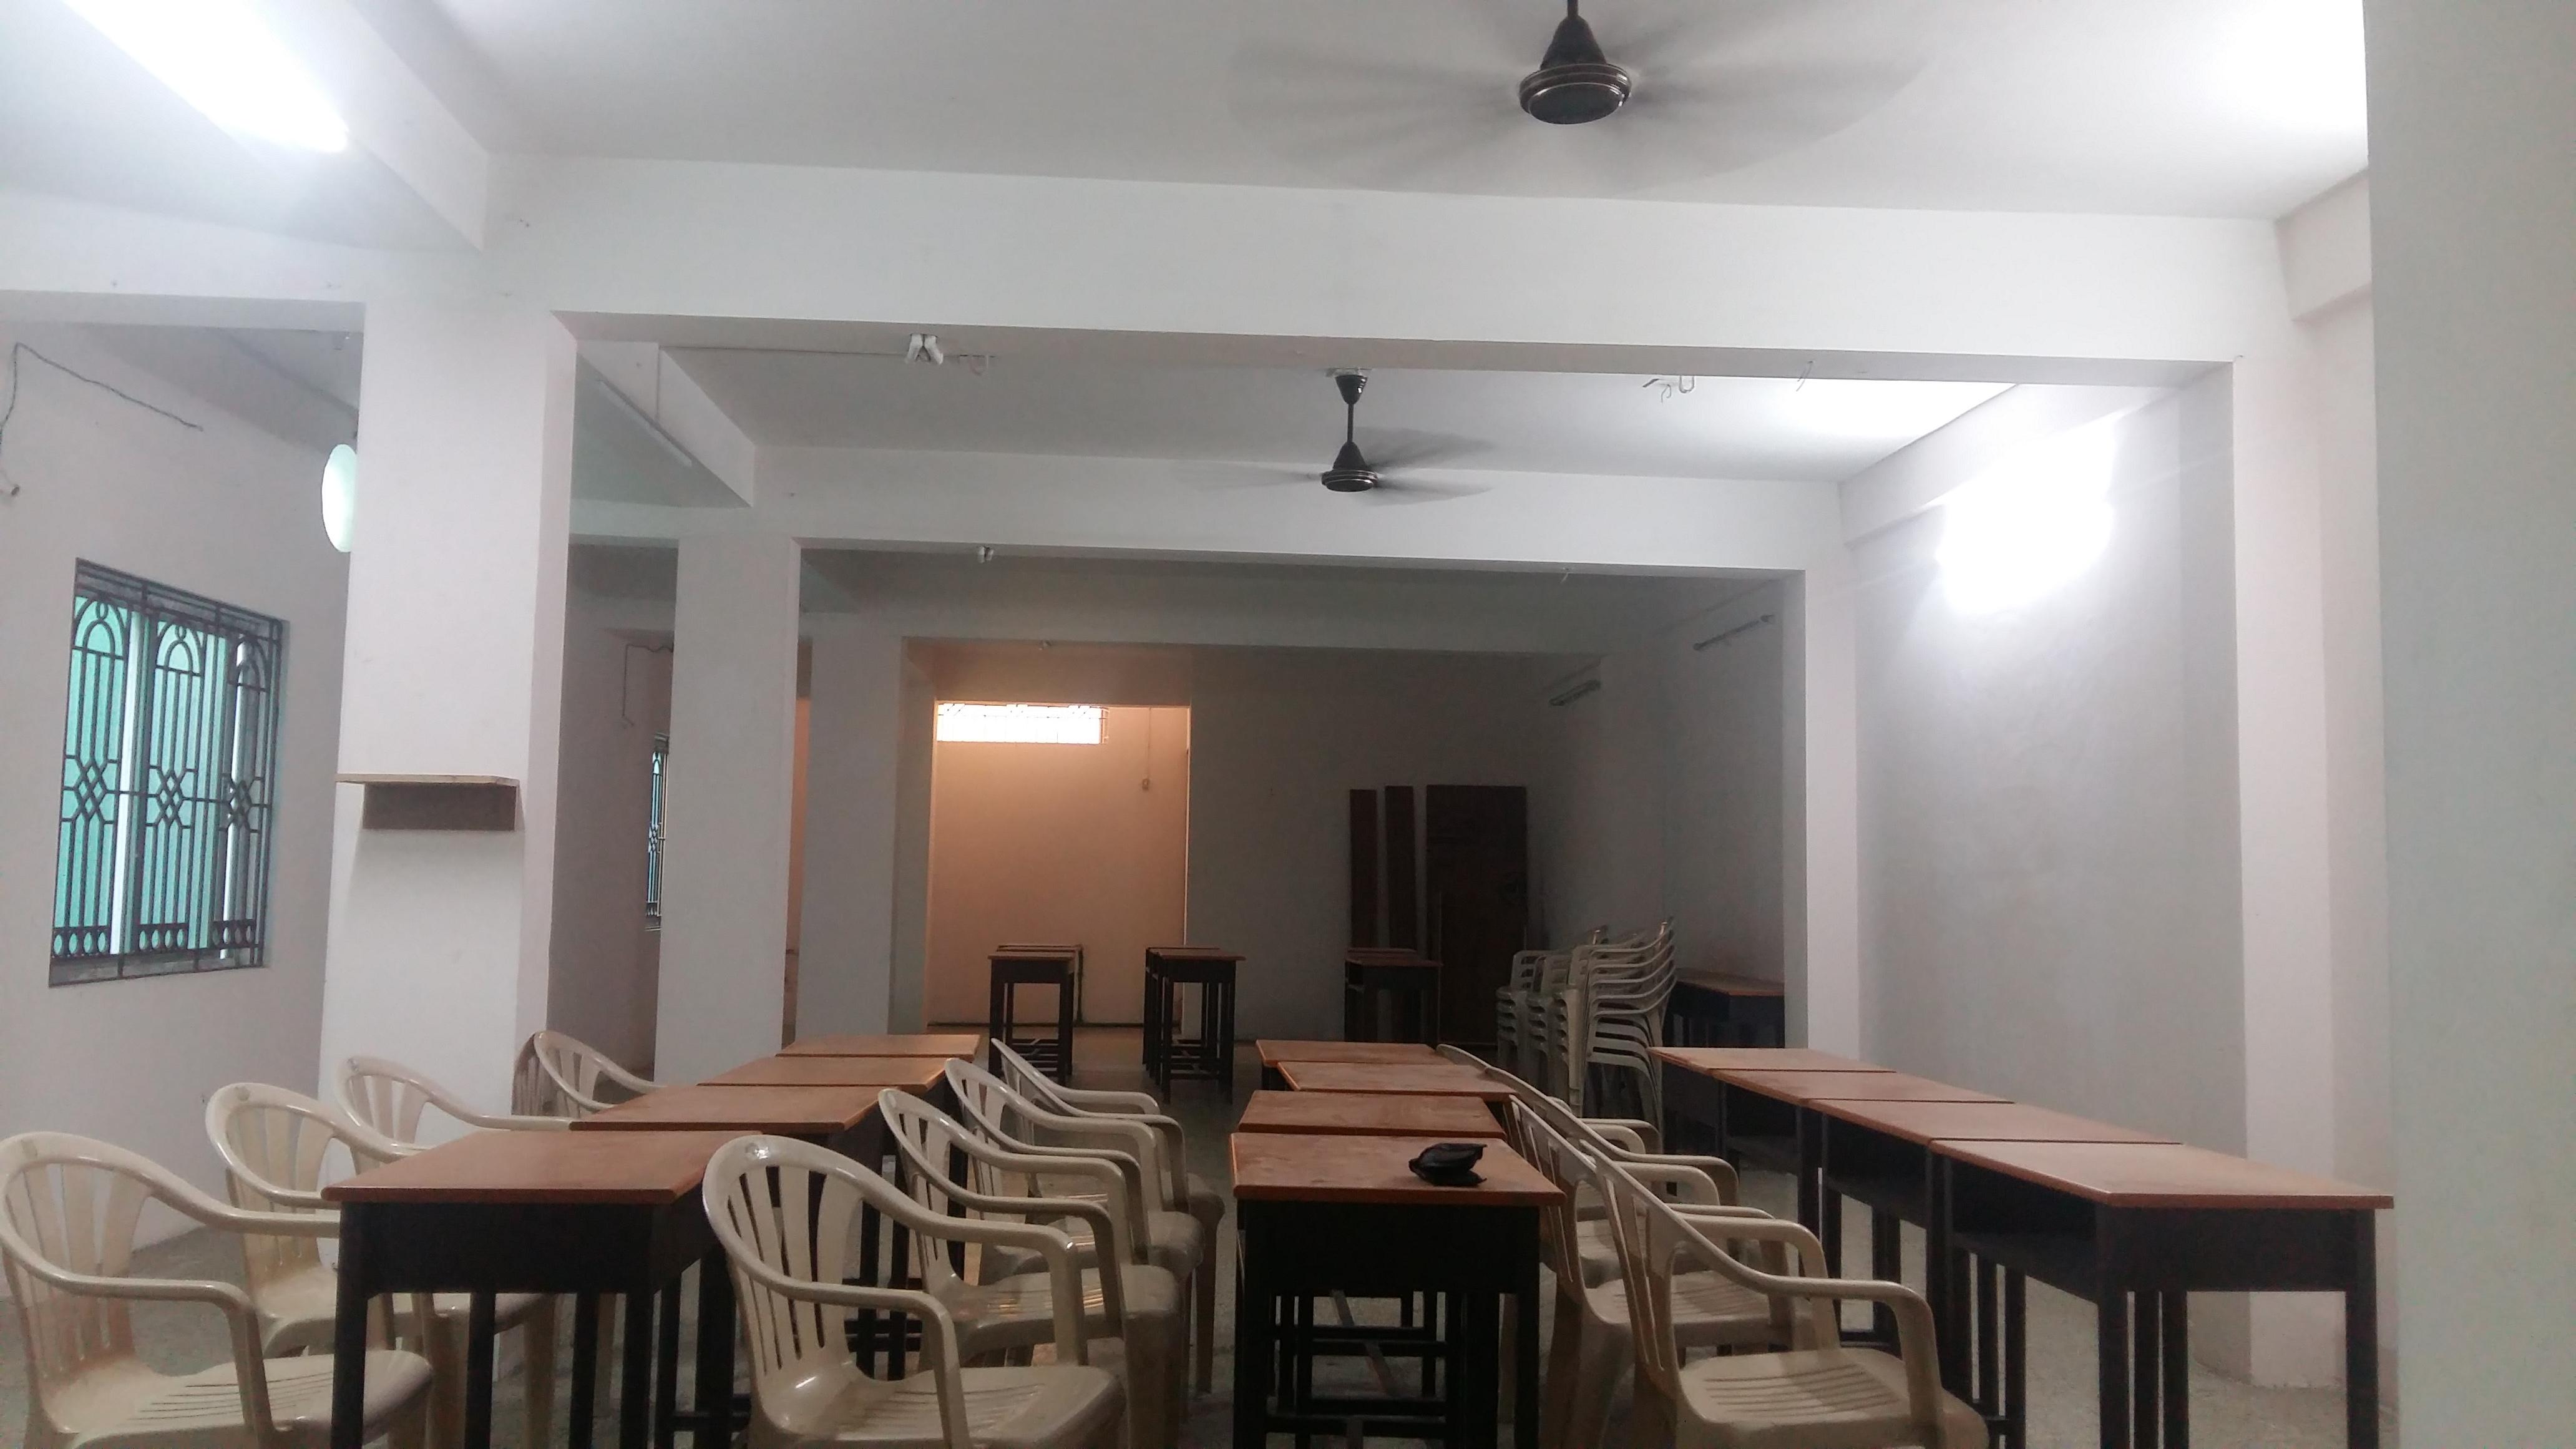 Class room 01